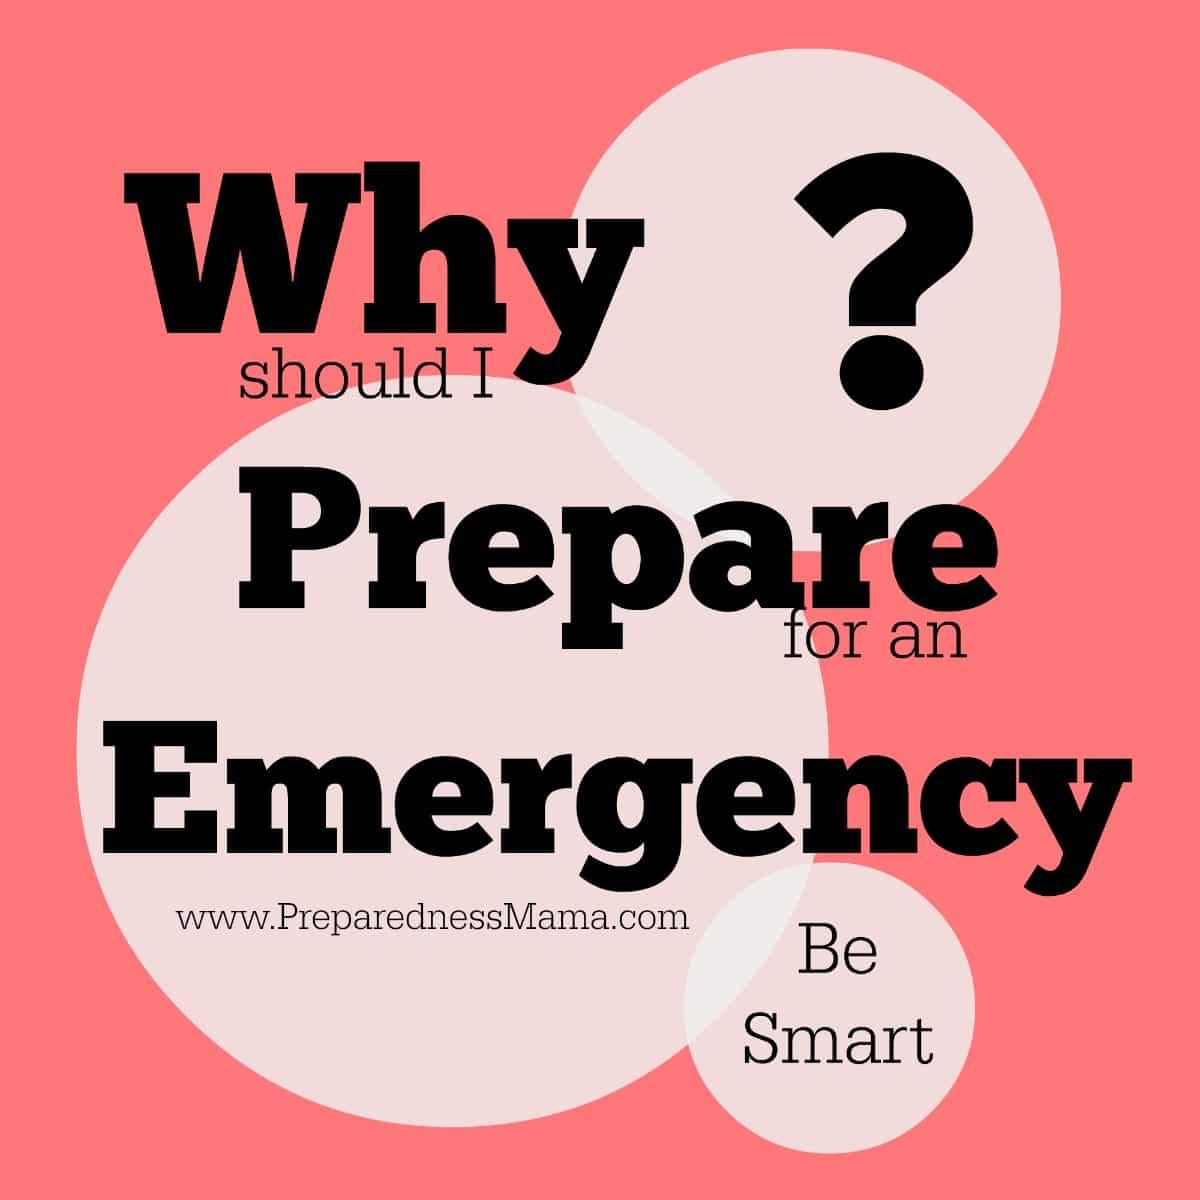 Why should I prepare for an emergency? | PreparednessMama